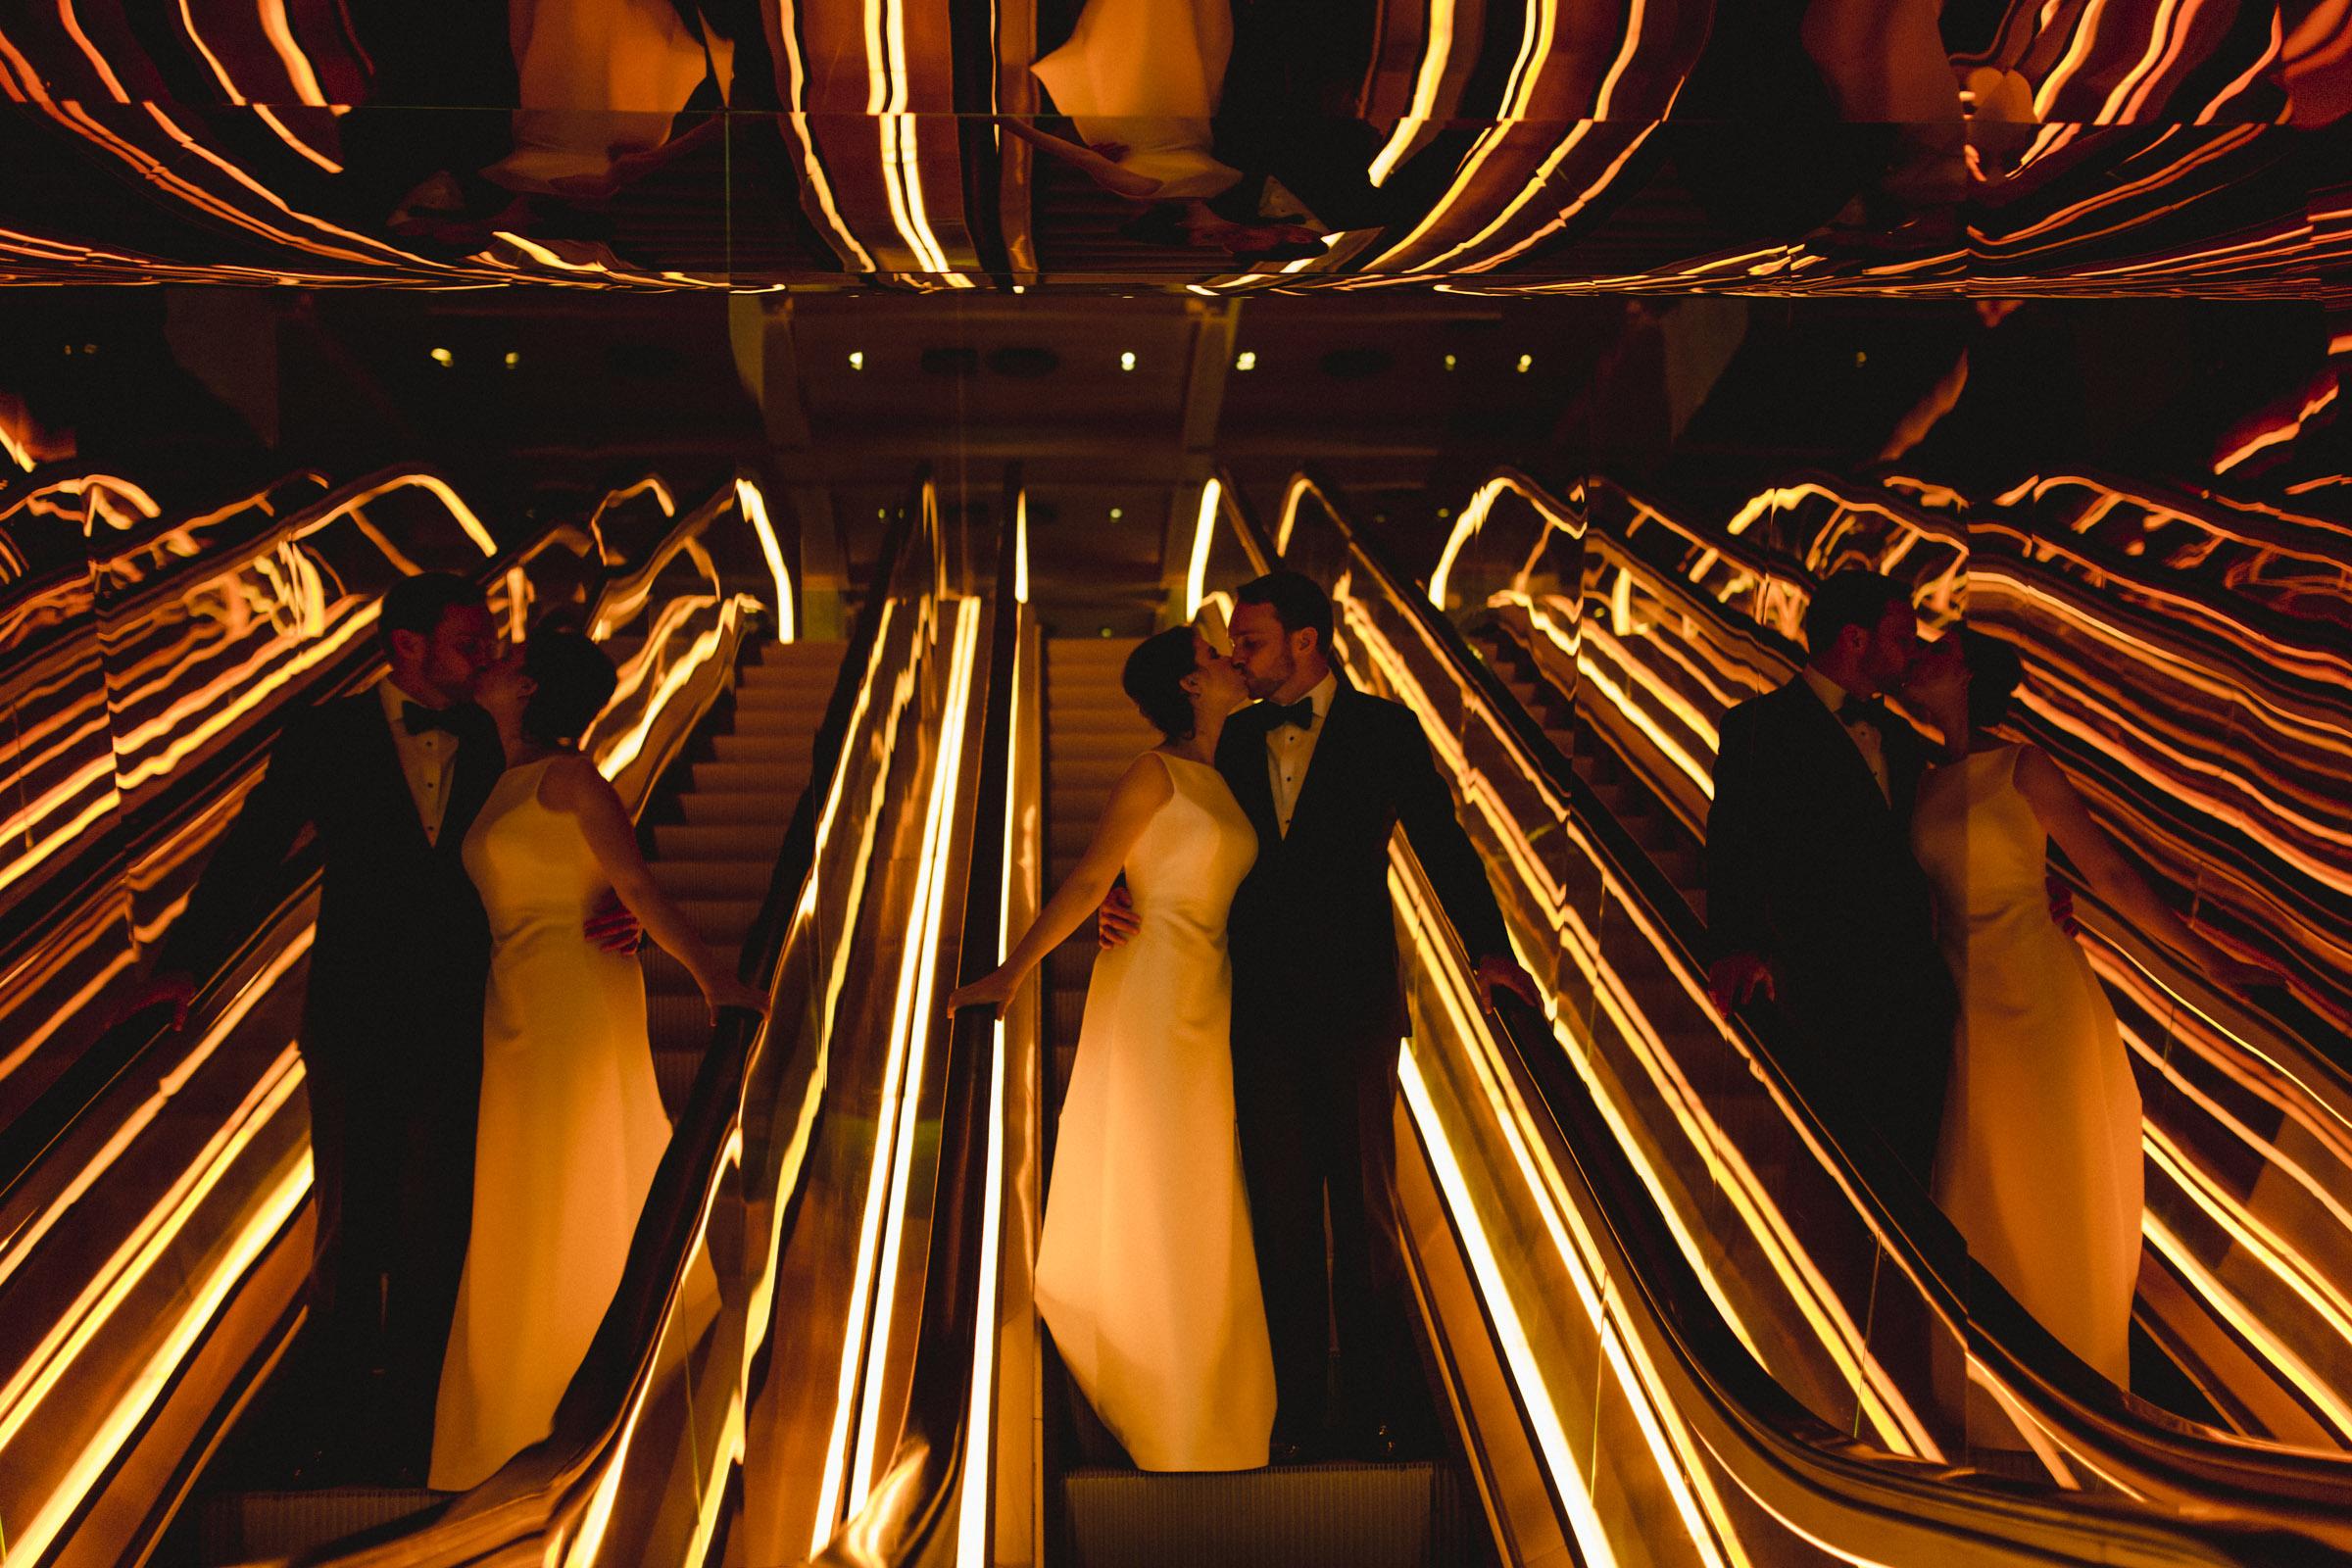 Amy Sims Photography | Bride and groom share a kiss on an escalator bathed in orange light | Public hotel wedding | New York Wedding photographer | Manhattan wedding photography